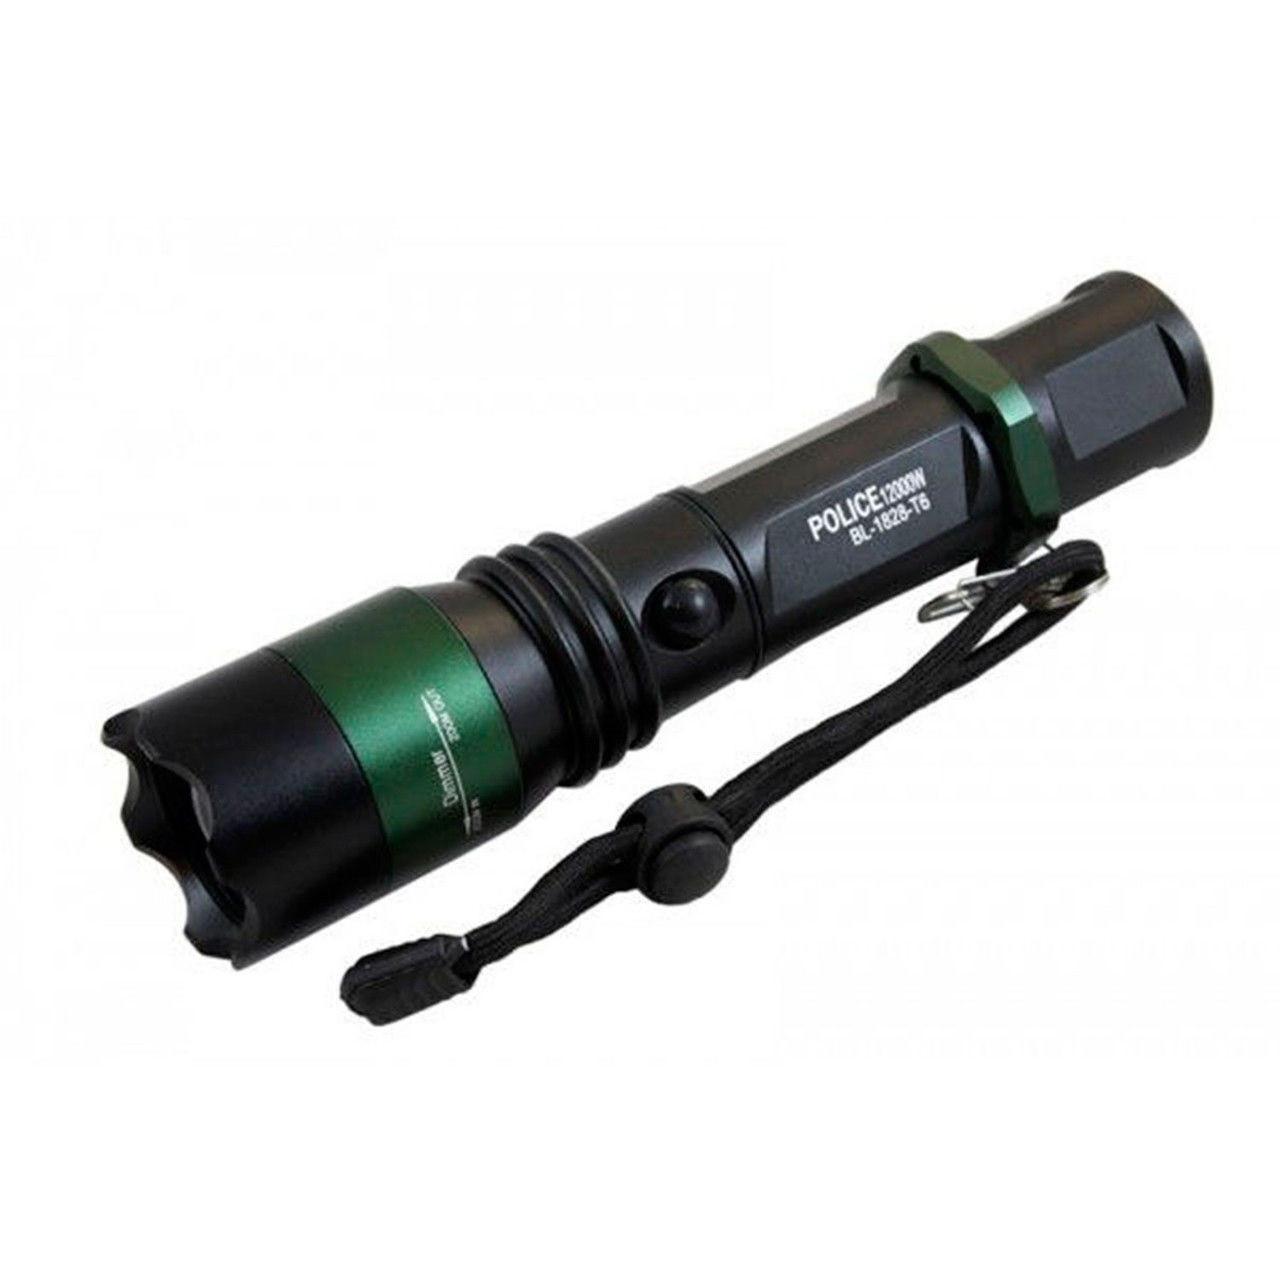 Тактический фонарик Police BL-1828-T6 50000W